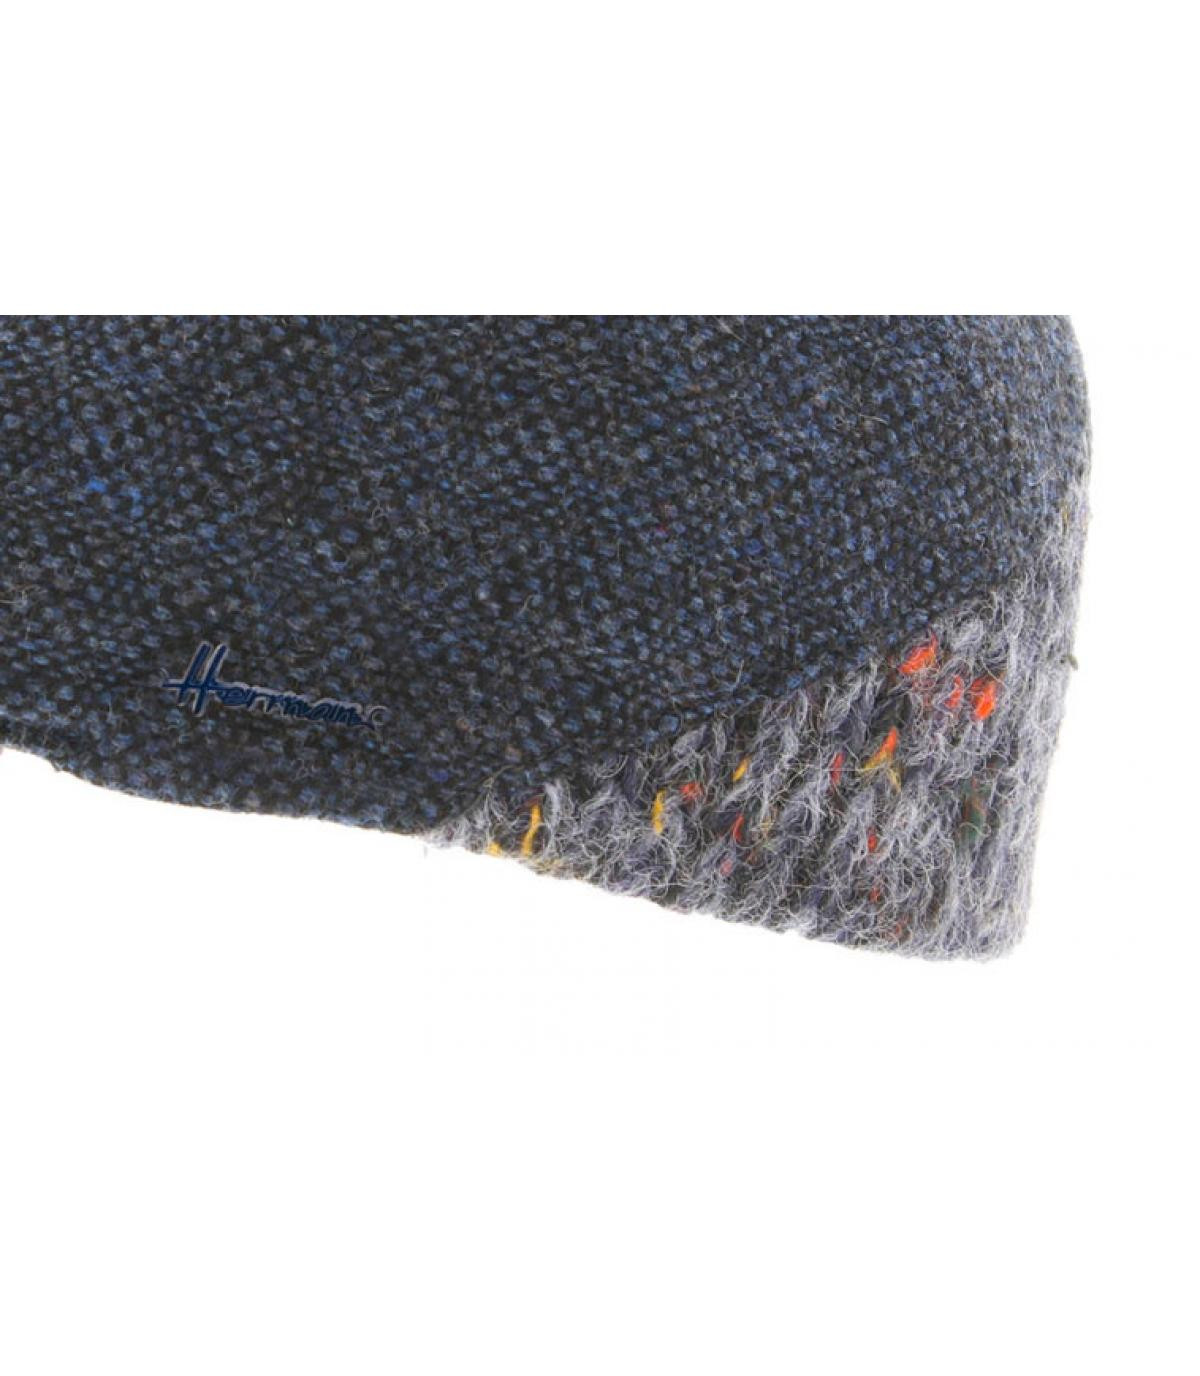 Dettagli Range Wool blue - image 3